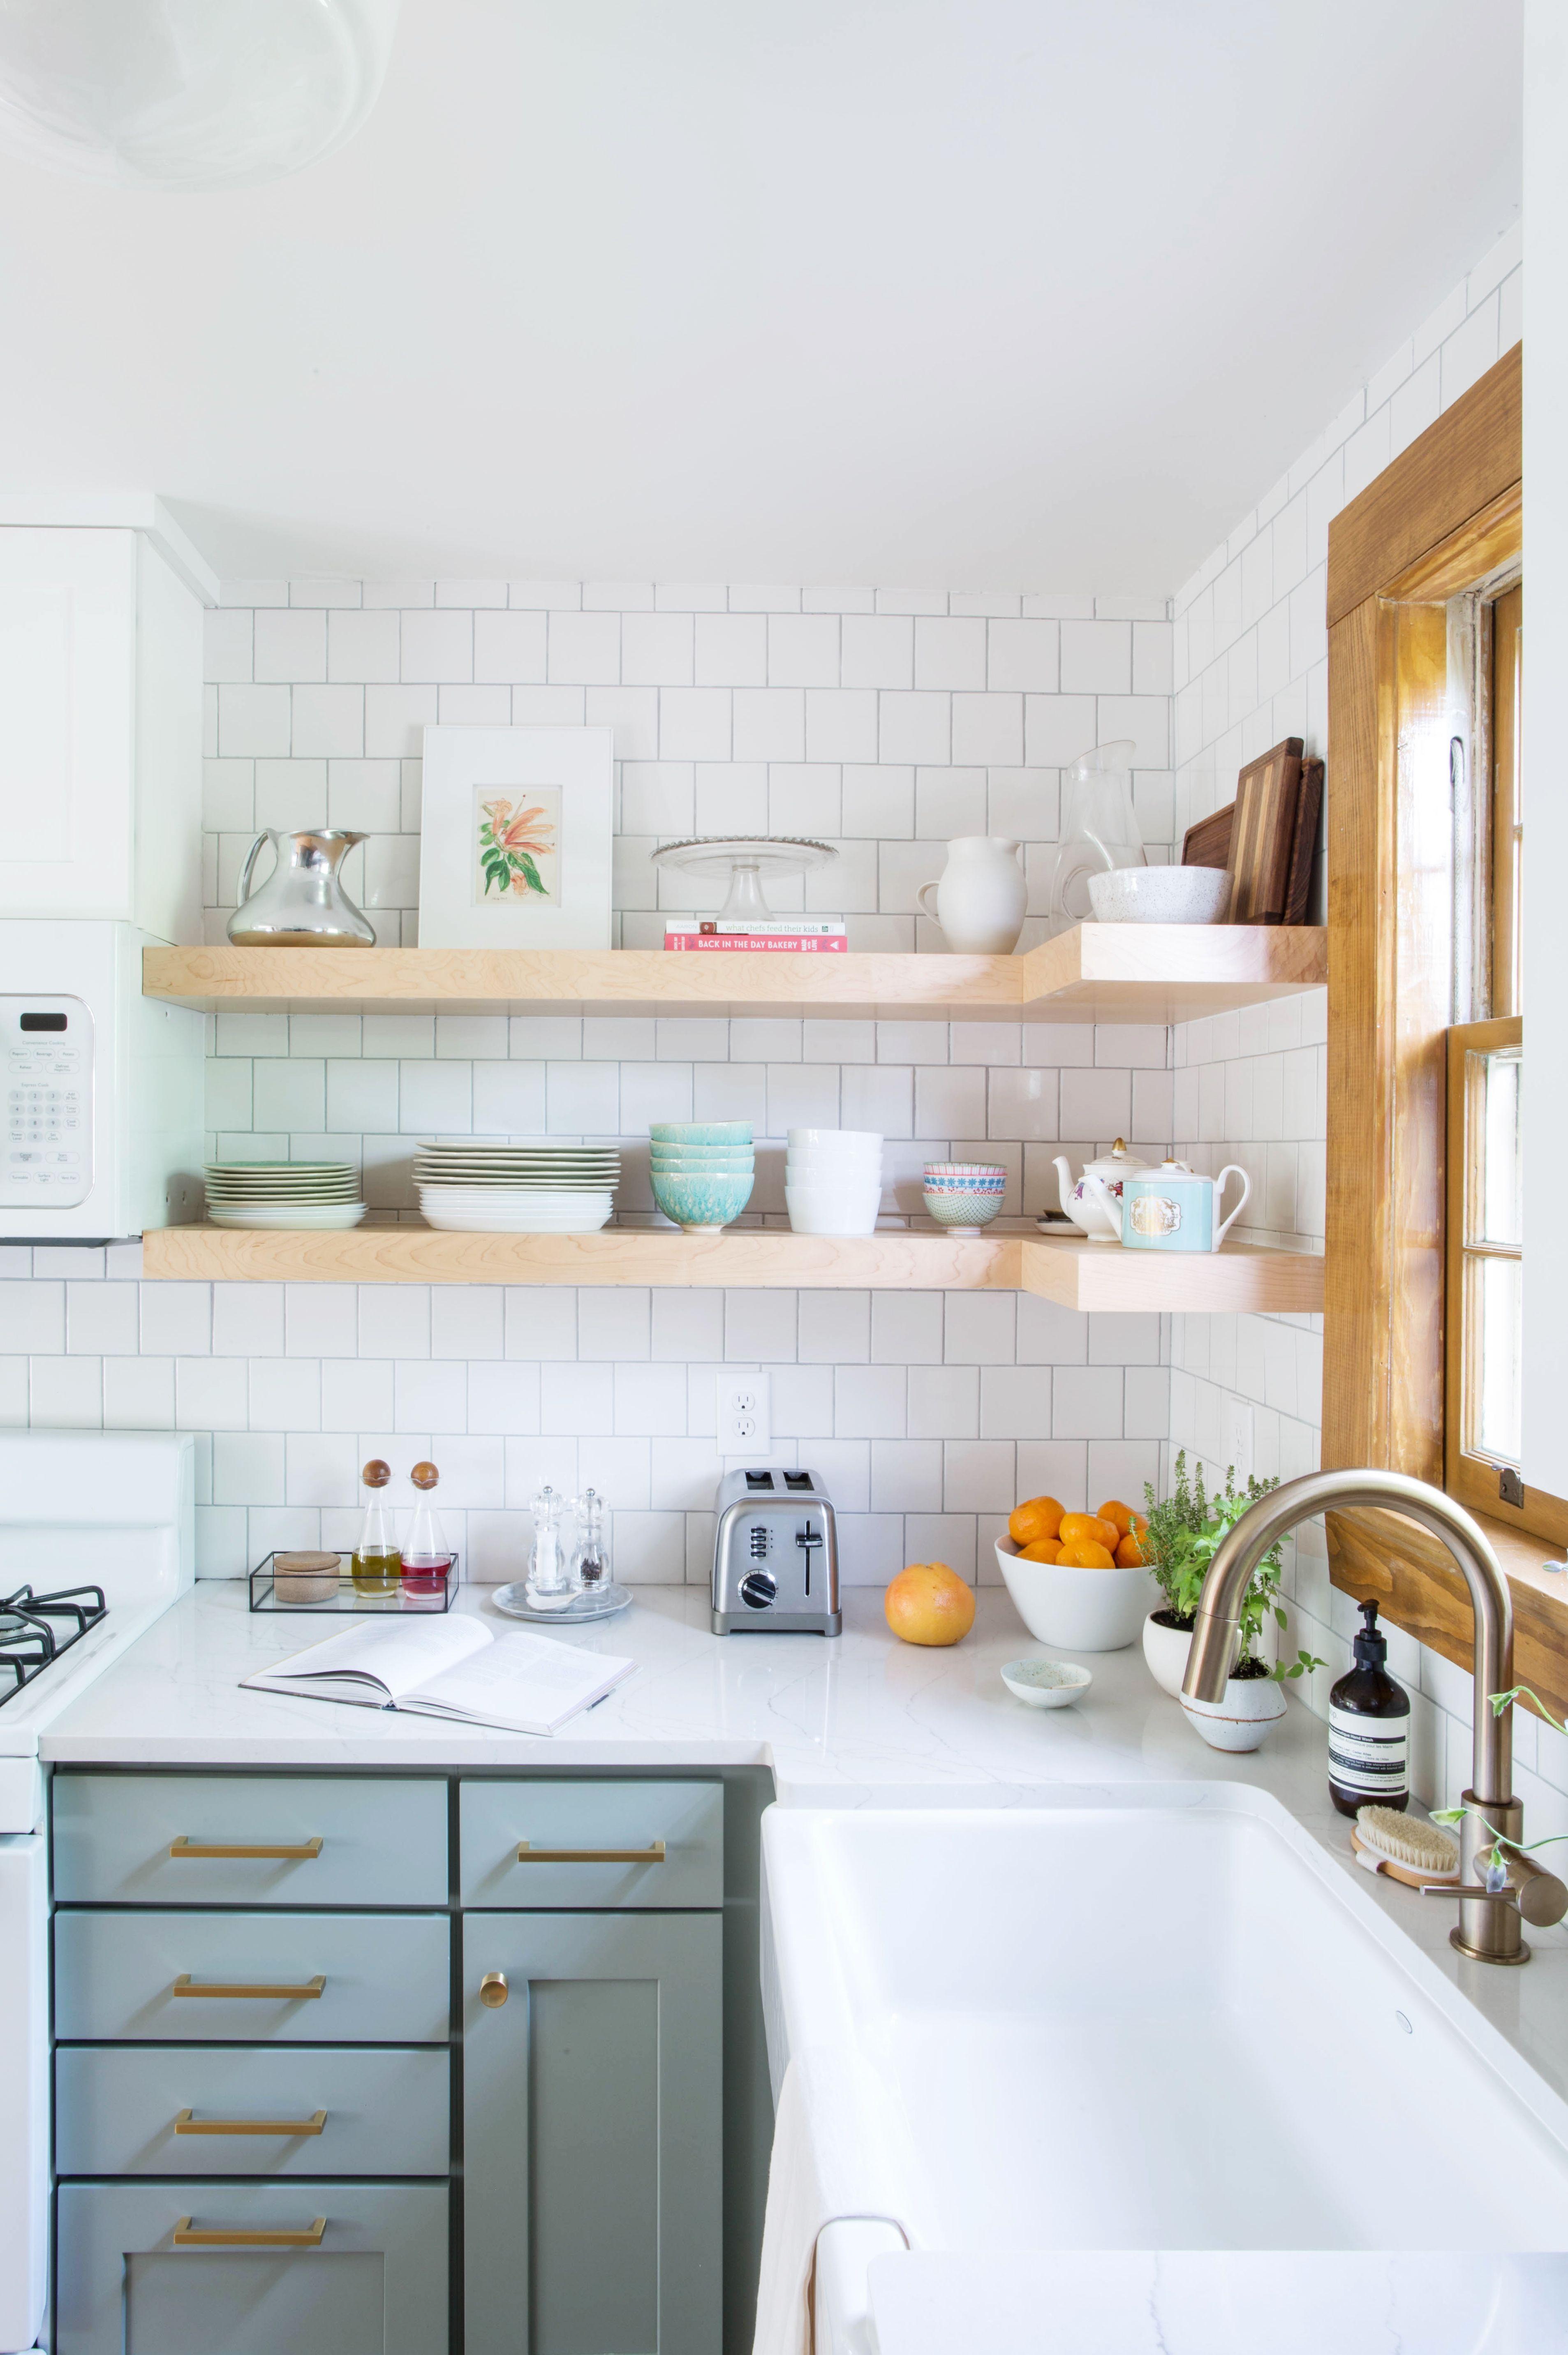 Pinterest || tobieornottobie | a b o d e | Pinterest | Kitchens ...